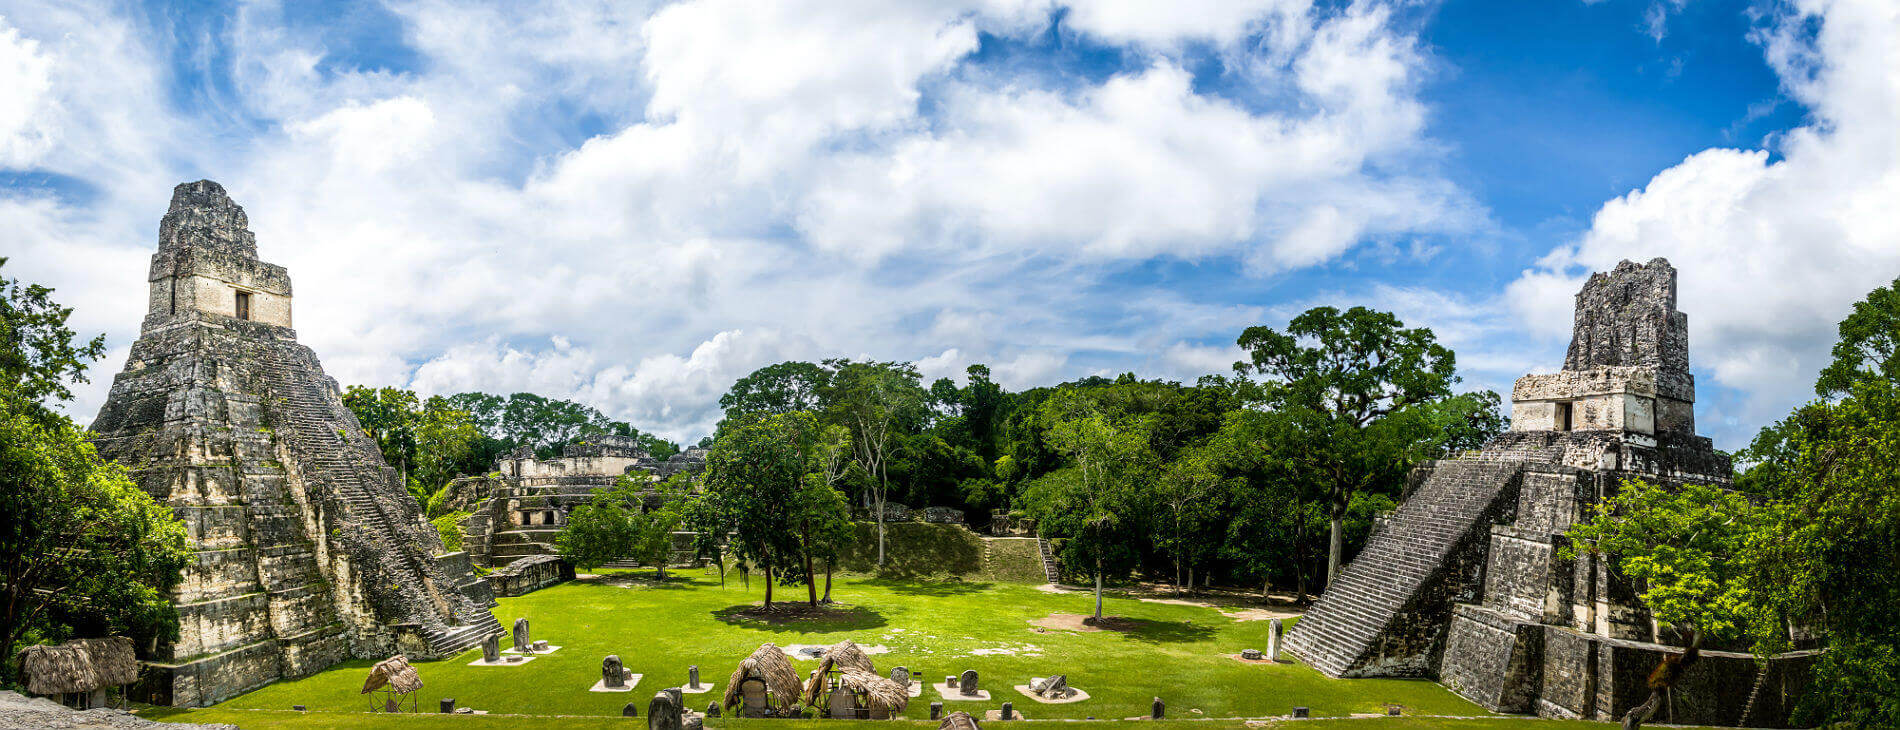 Mastro Patagonico – Slide Home promo Guatemala Esotico